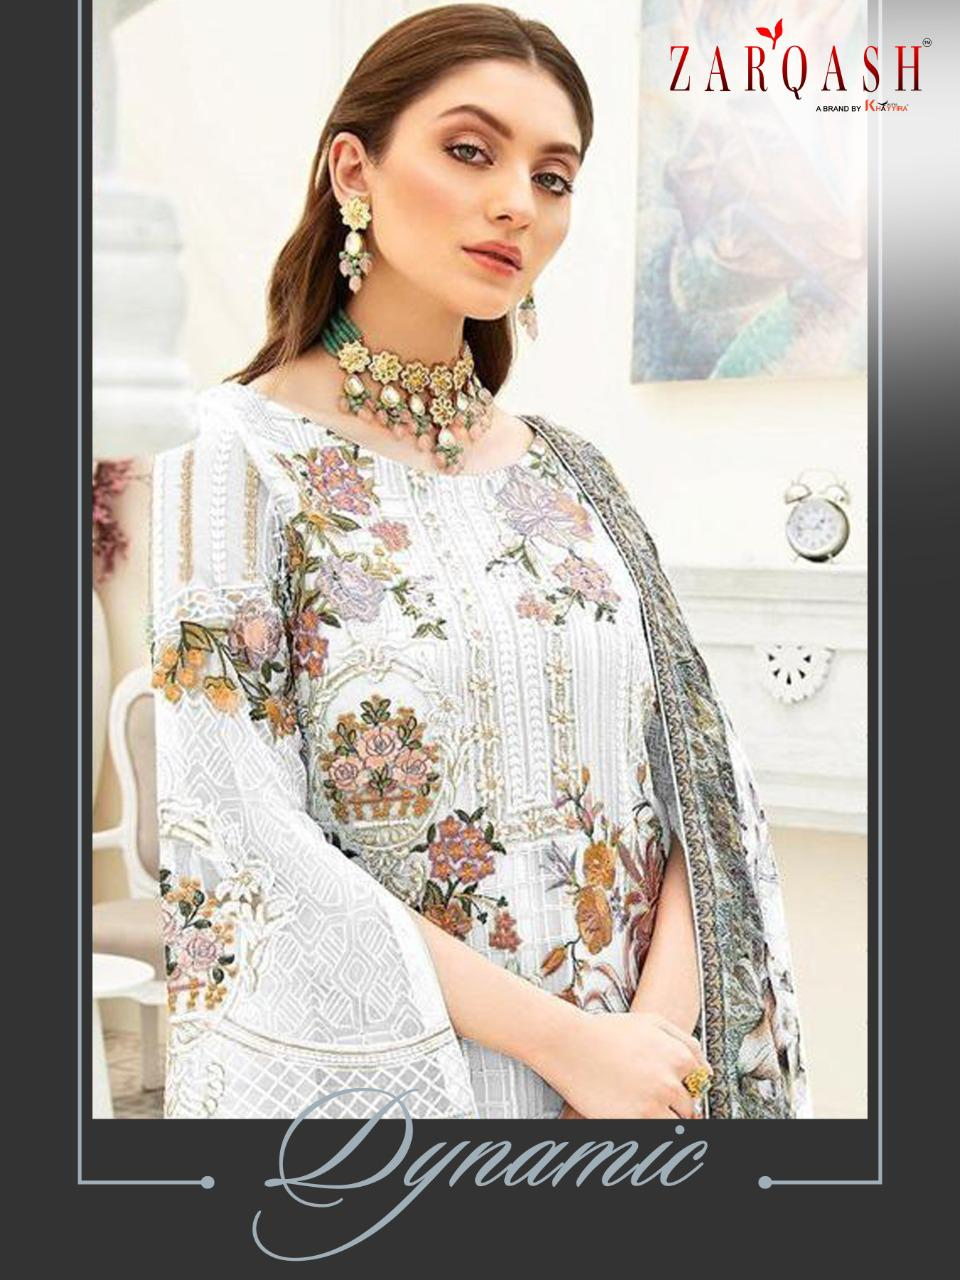 Zarqash Dynamic by Khayyira Salwar Suit Wholesale Catalog 4 Pcs 1 - Zarqash Dynamic by Khayyira Salwar Suit Wholesale Catalog 4 Pcs